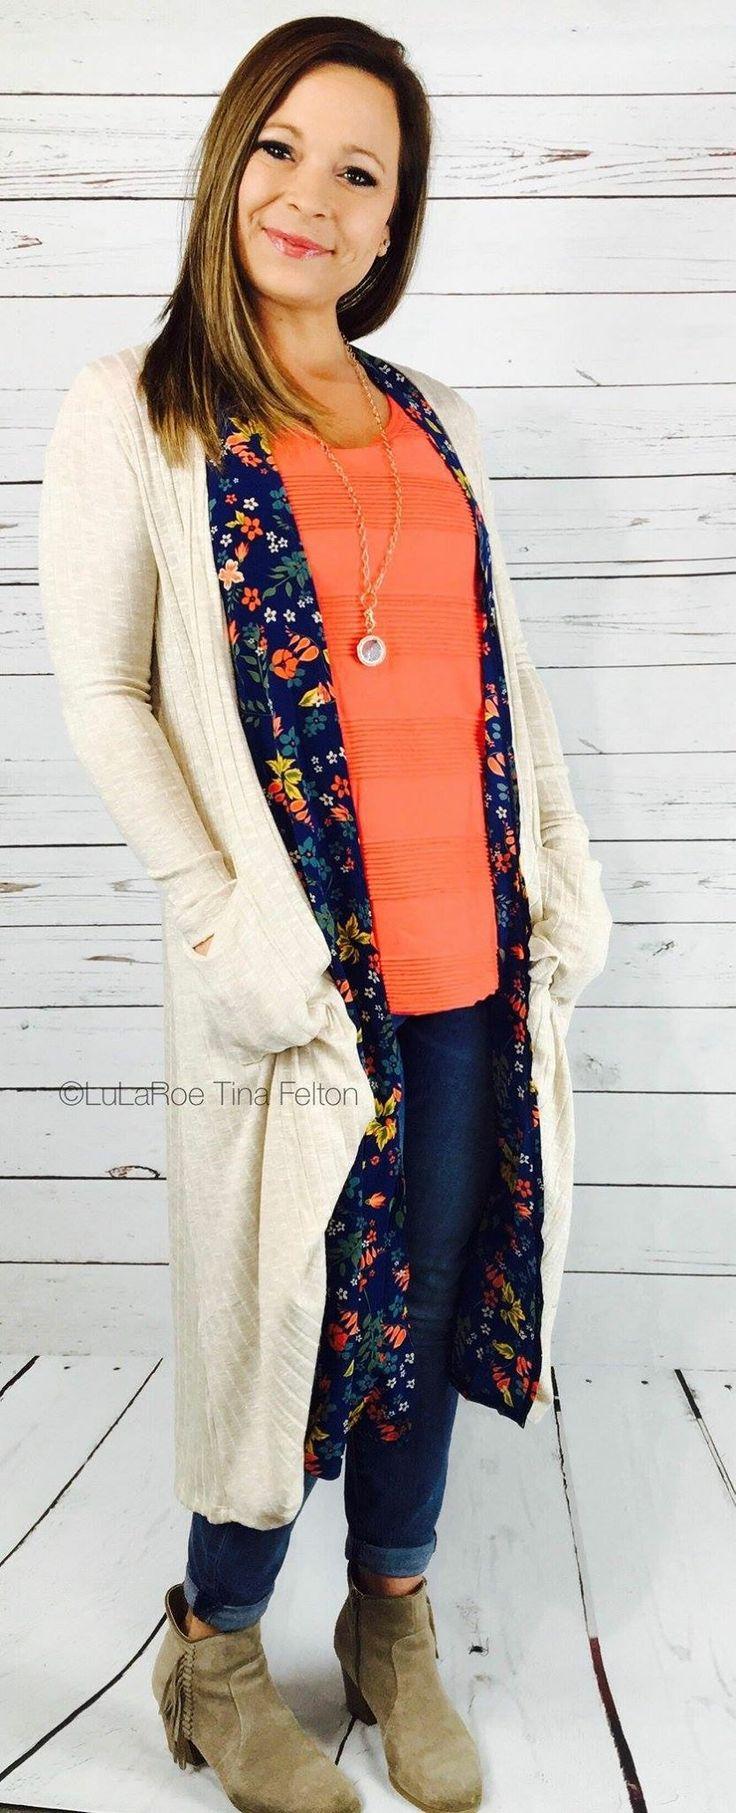 Sarah Joy And Classic T Lularoetinafelton Lularoe Outfits | LuLa Love